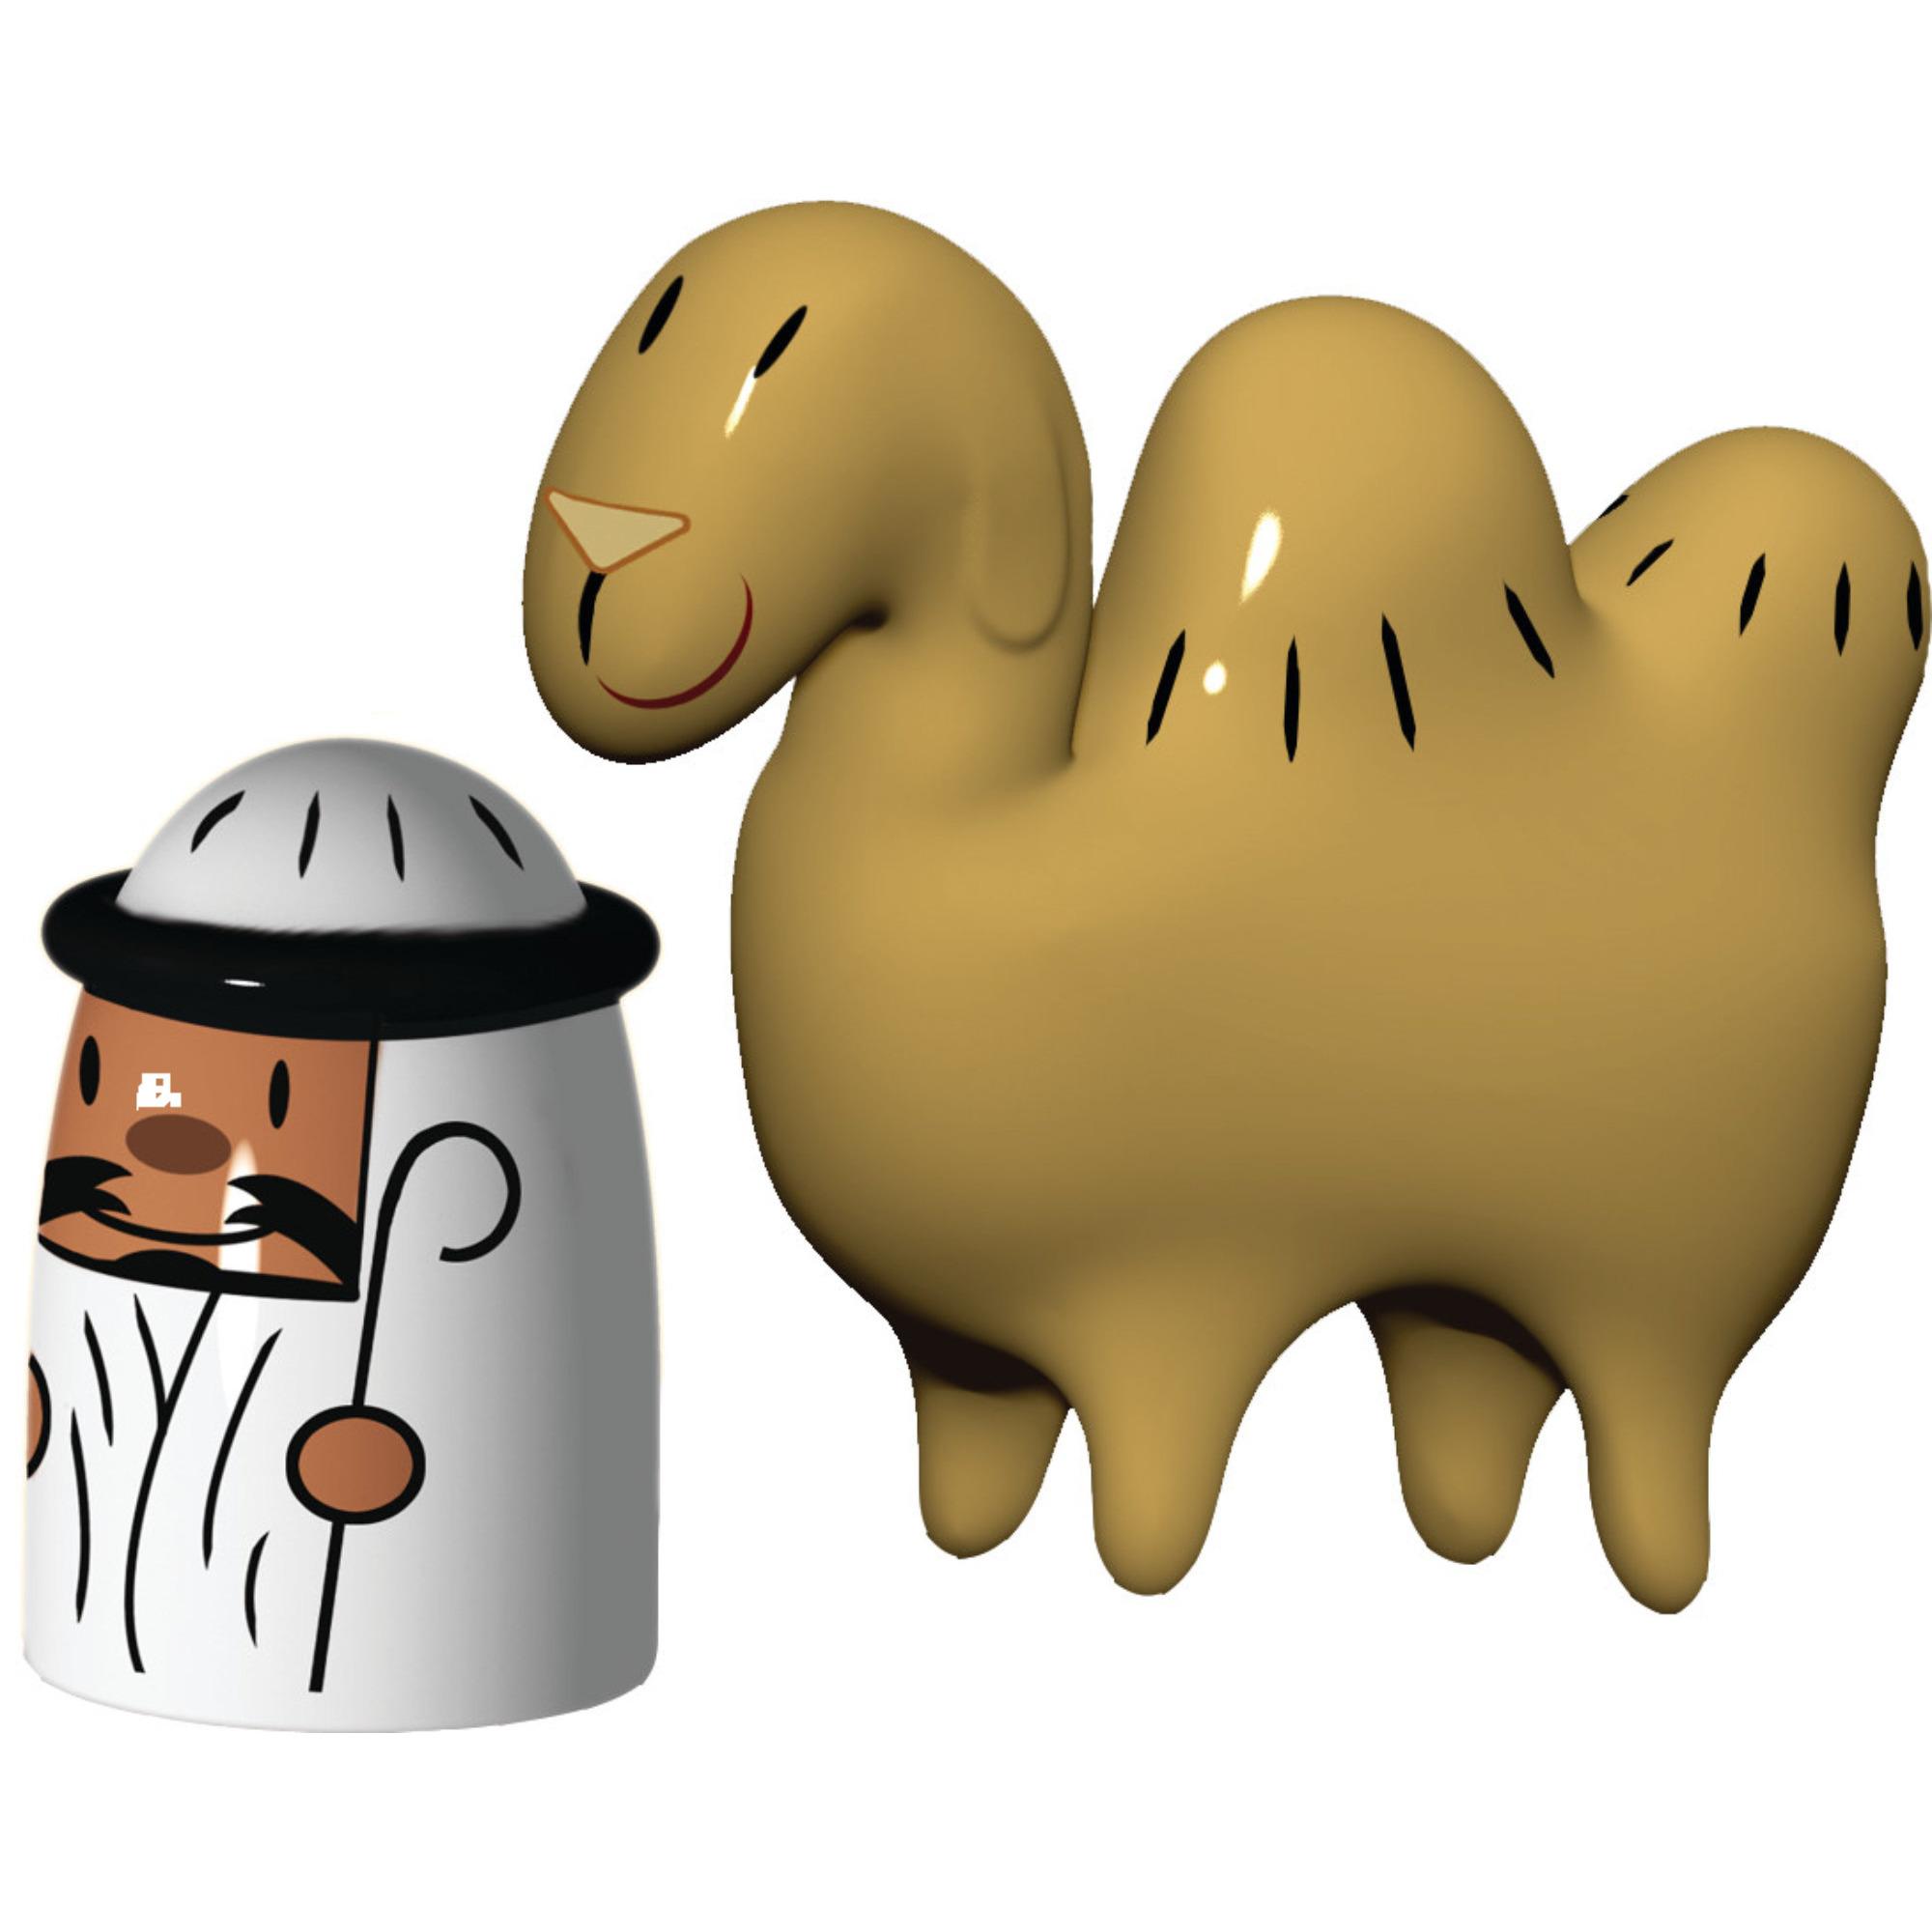 Alessi Porslinsfigurer Amir och Kamelen